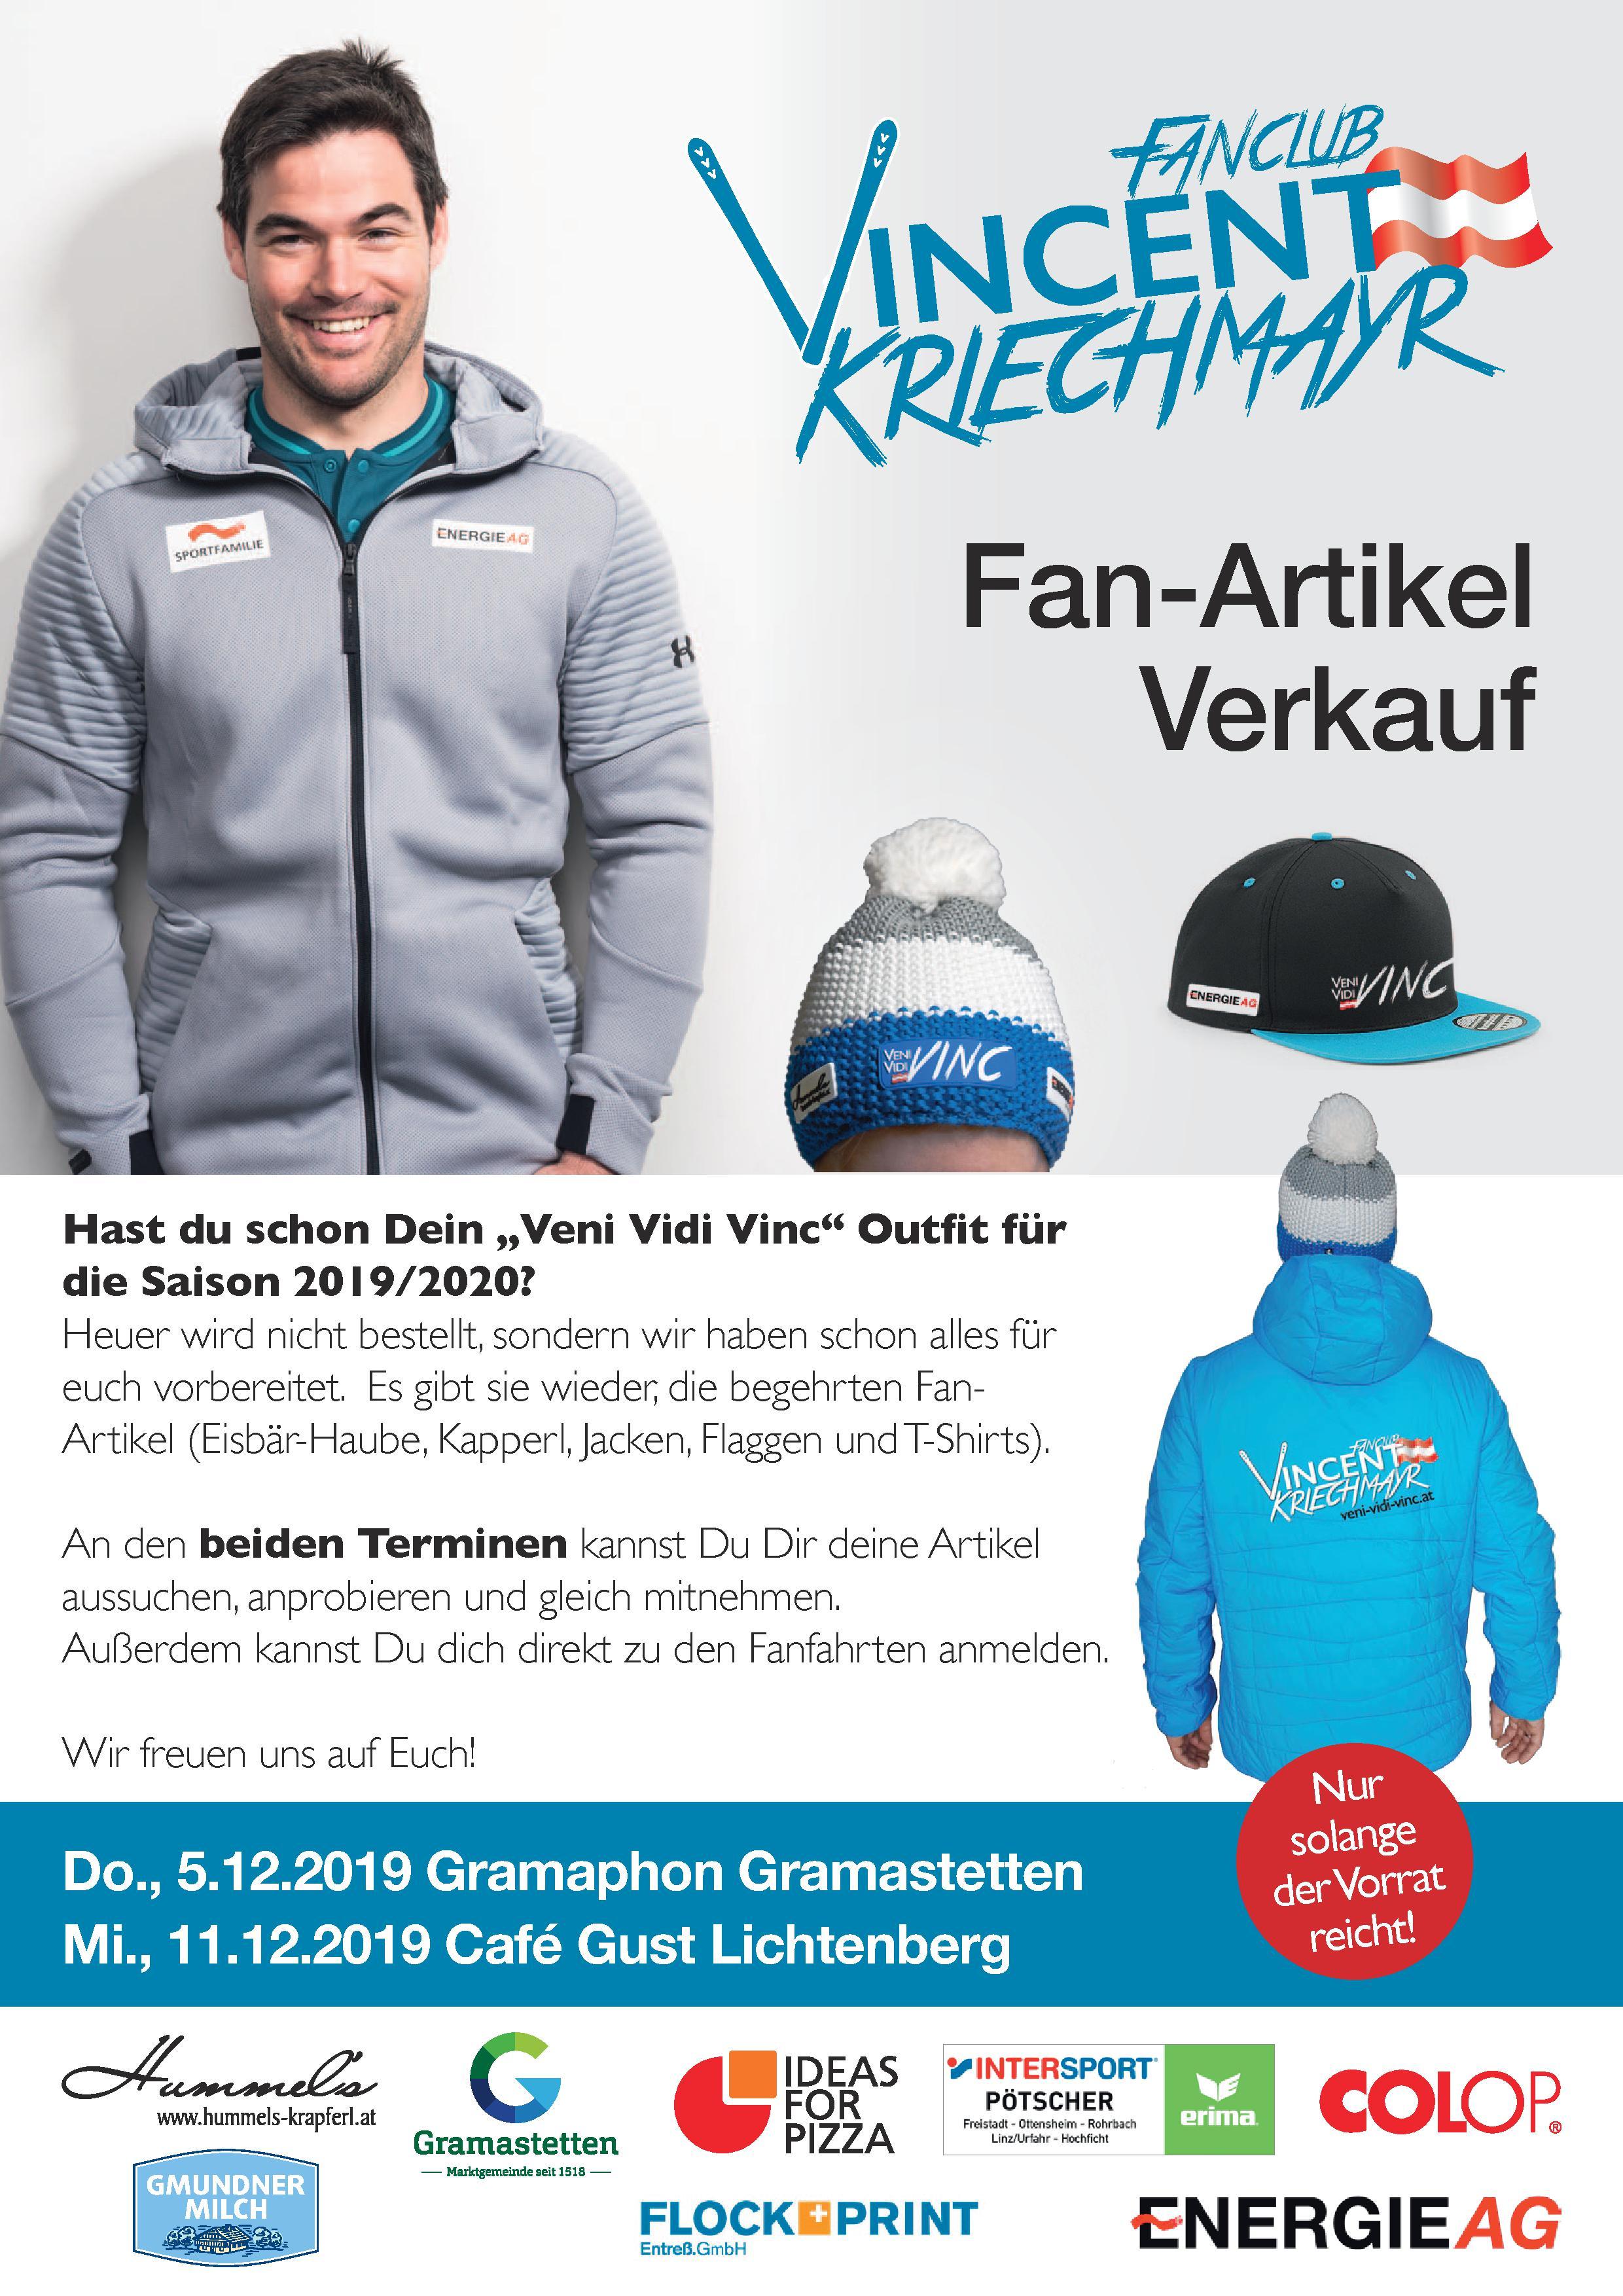 Fanartikel_Verkauf